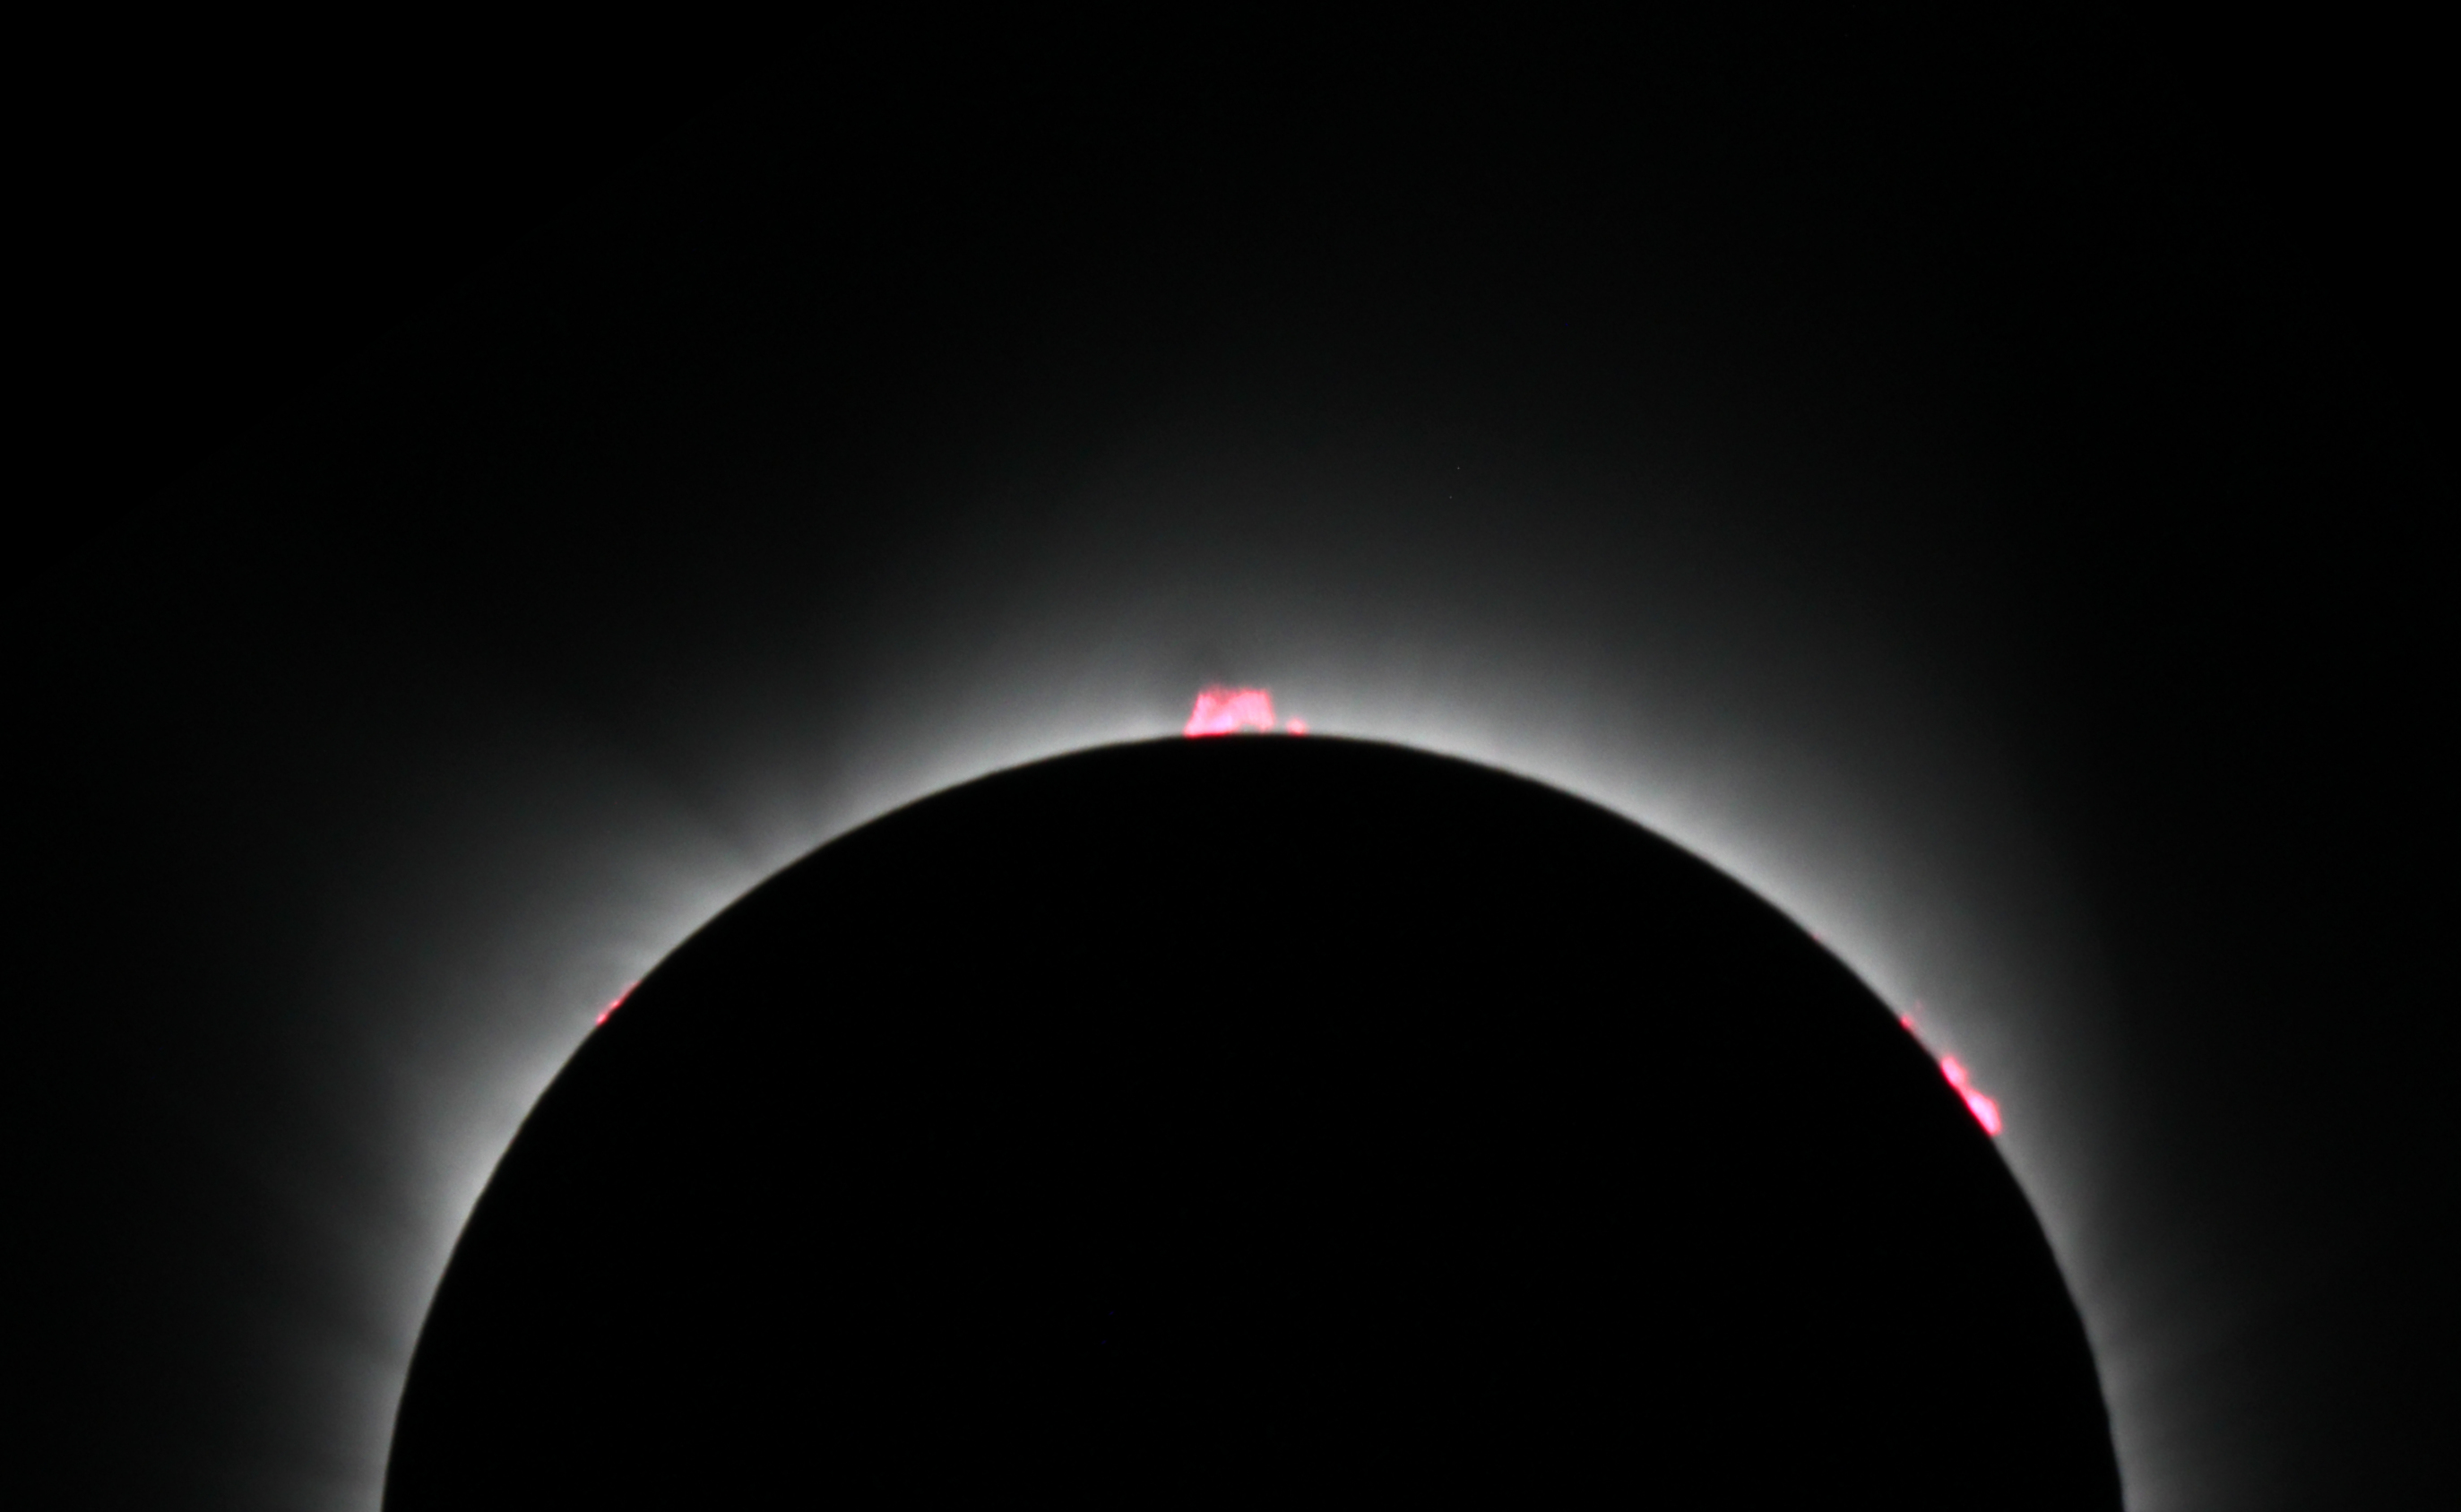 20170821_eclissi-protuberanze01_AlessandroDimai